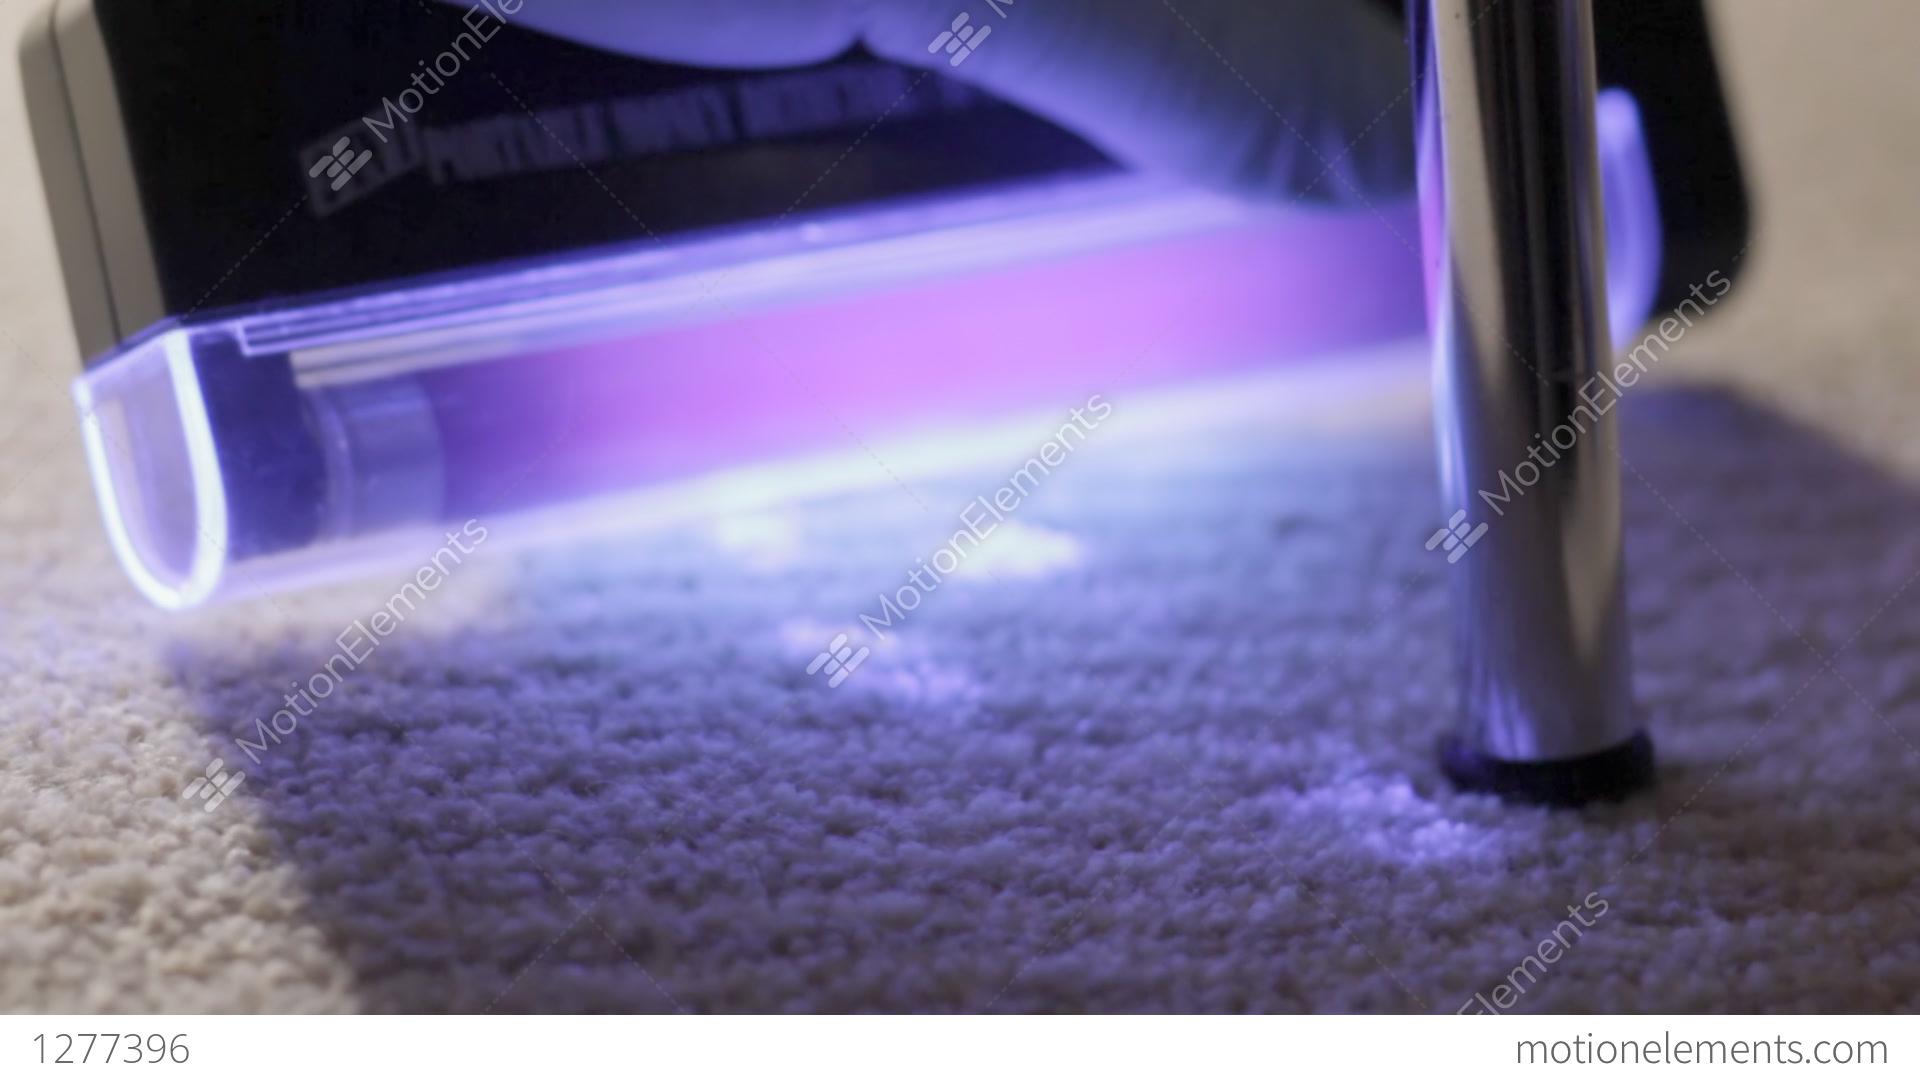 Blood Traces On Carpet Under Uv Light Stock Video Footage